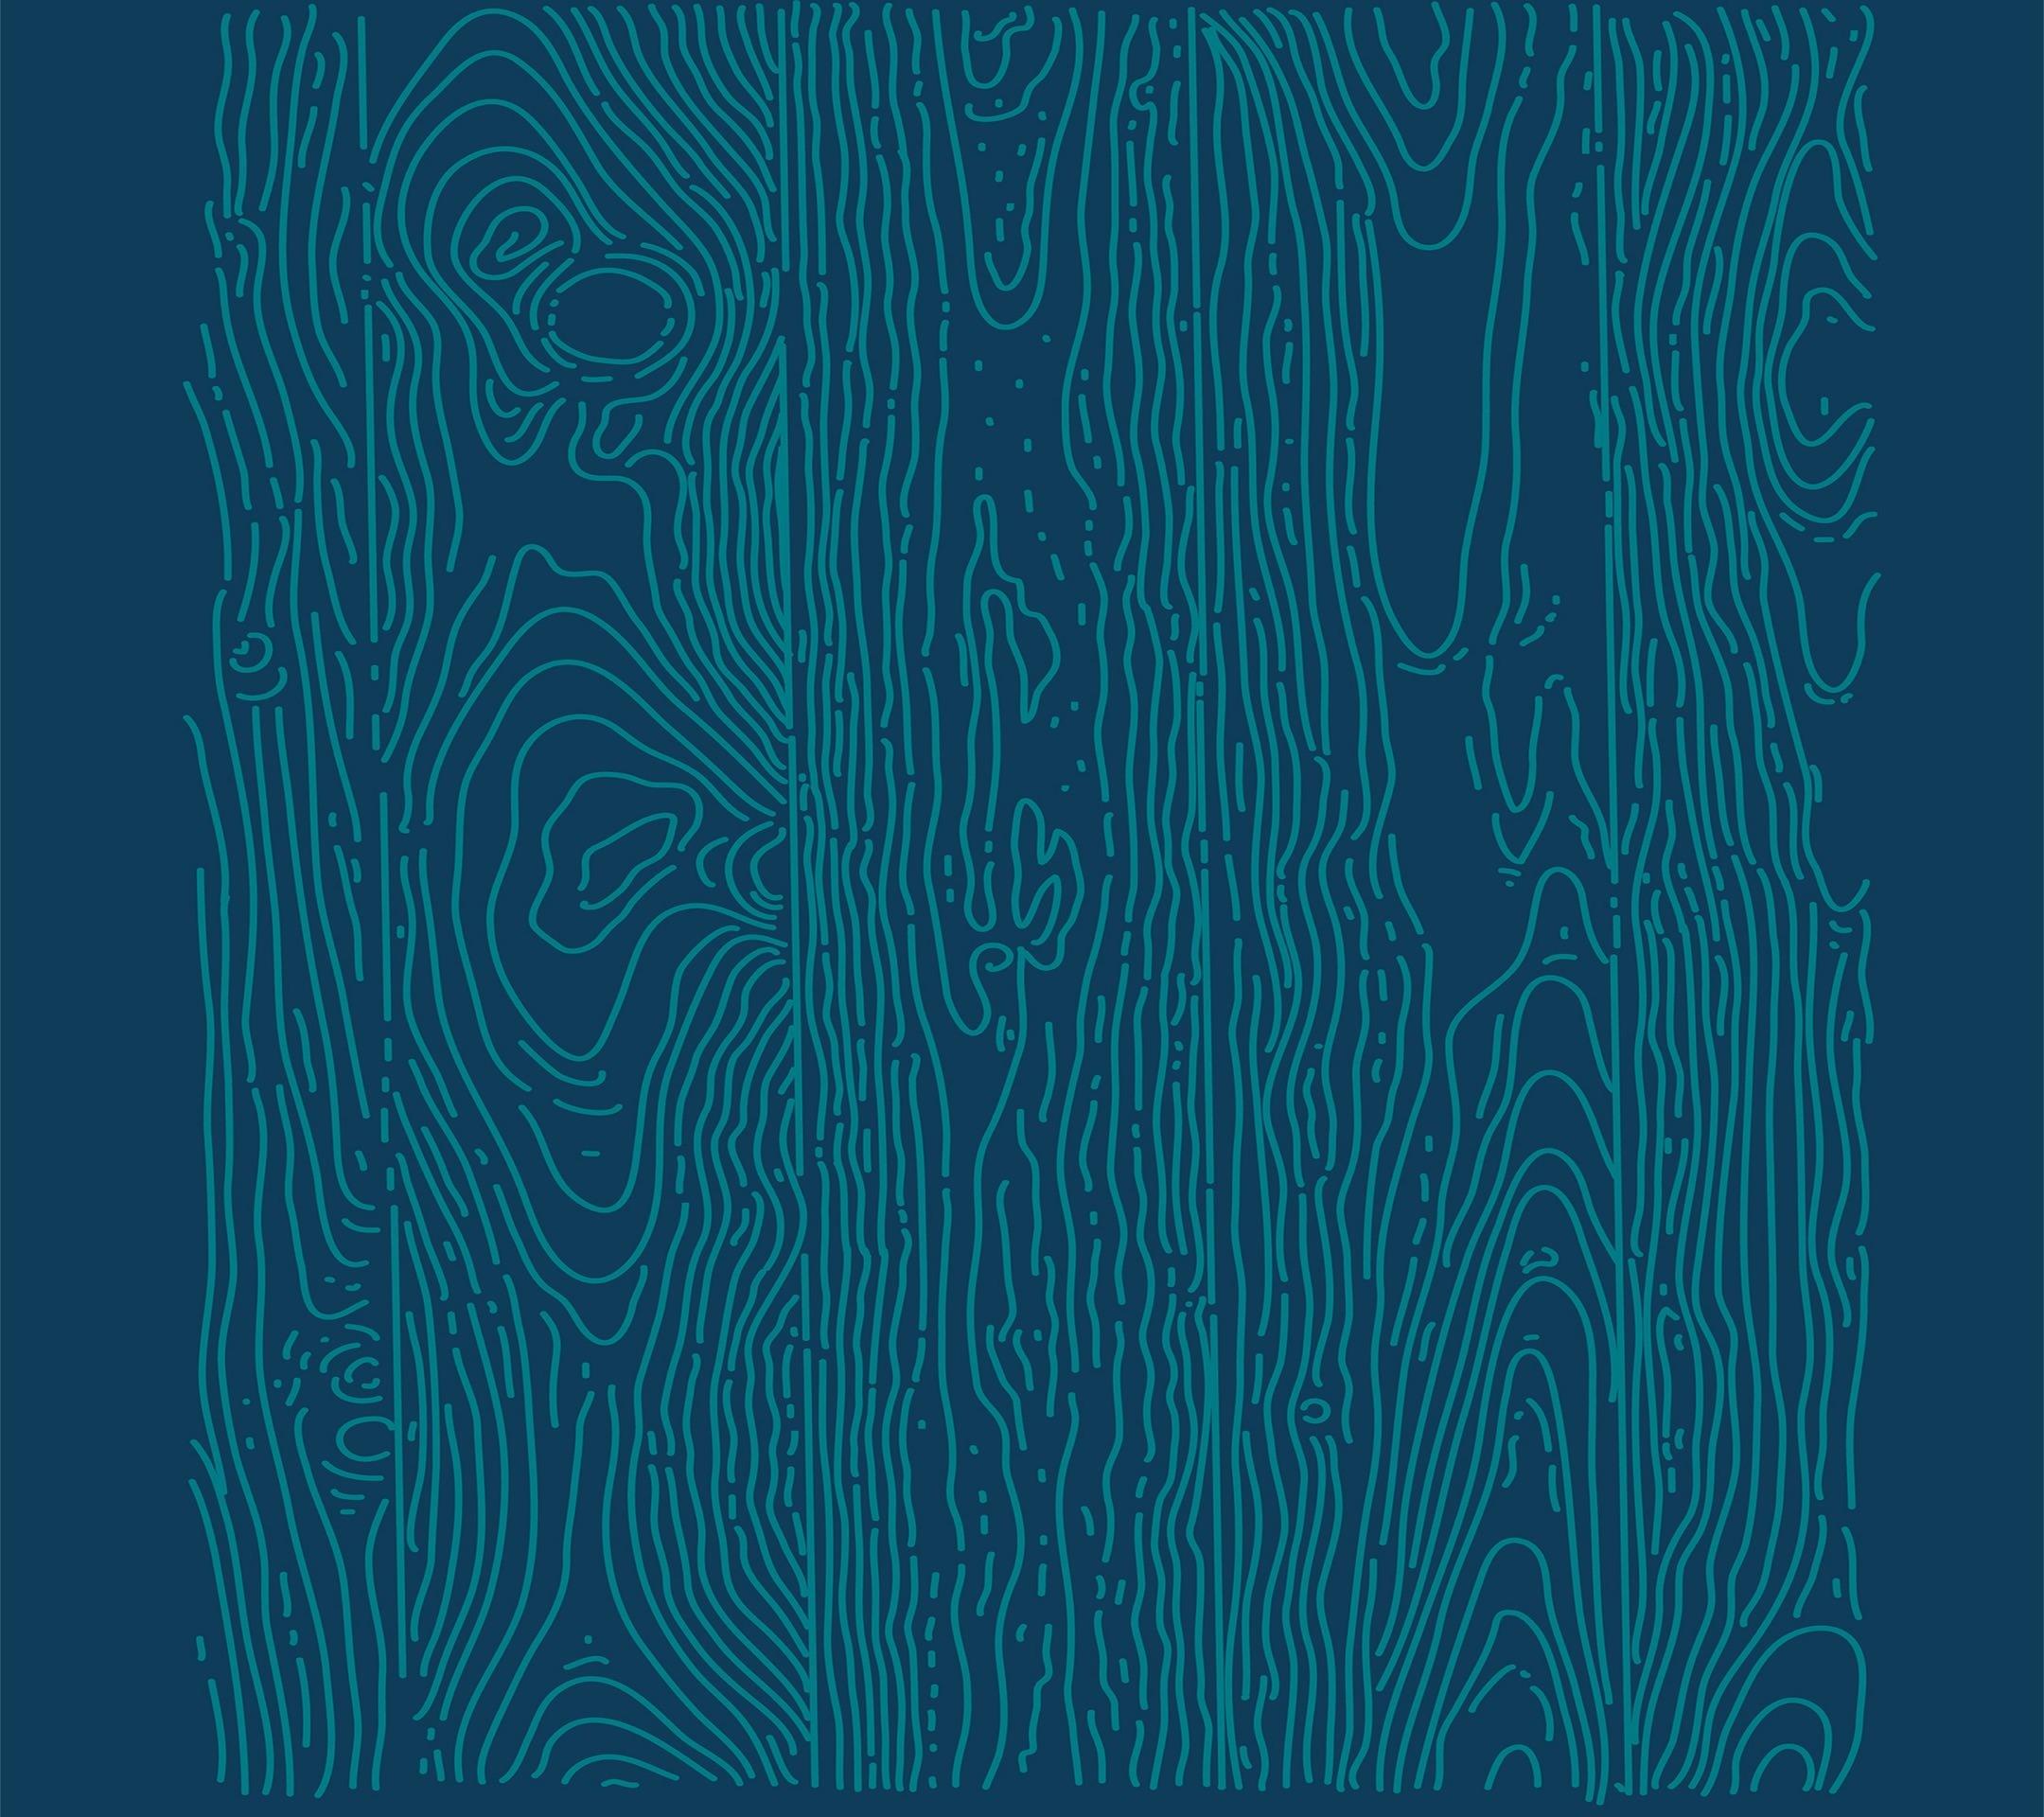 Illustrations grain blue navy blue Android SmartPhone Wallpaper